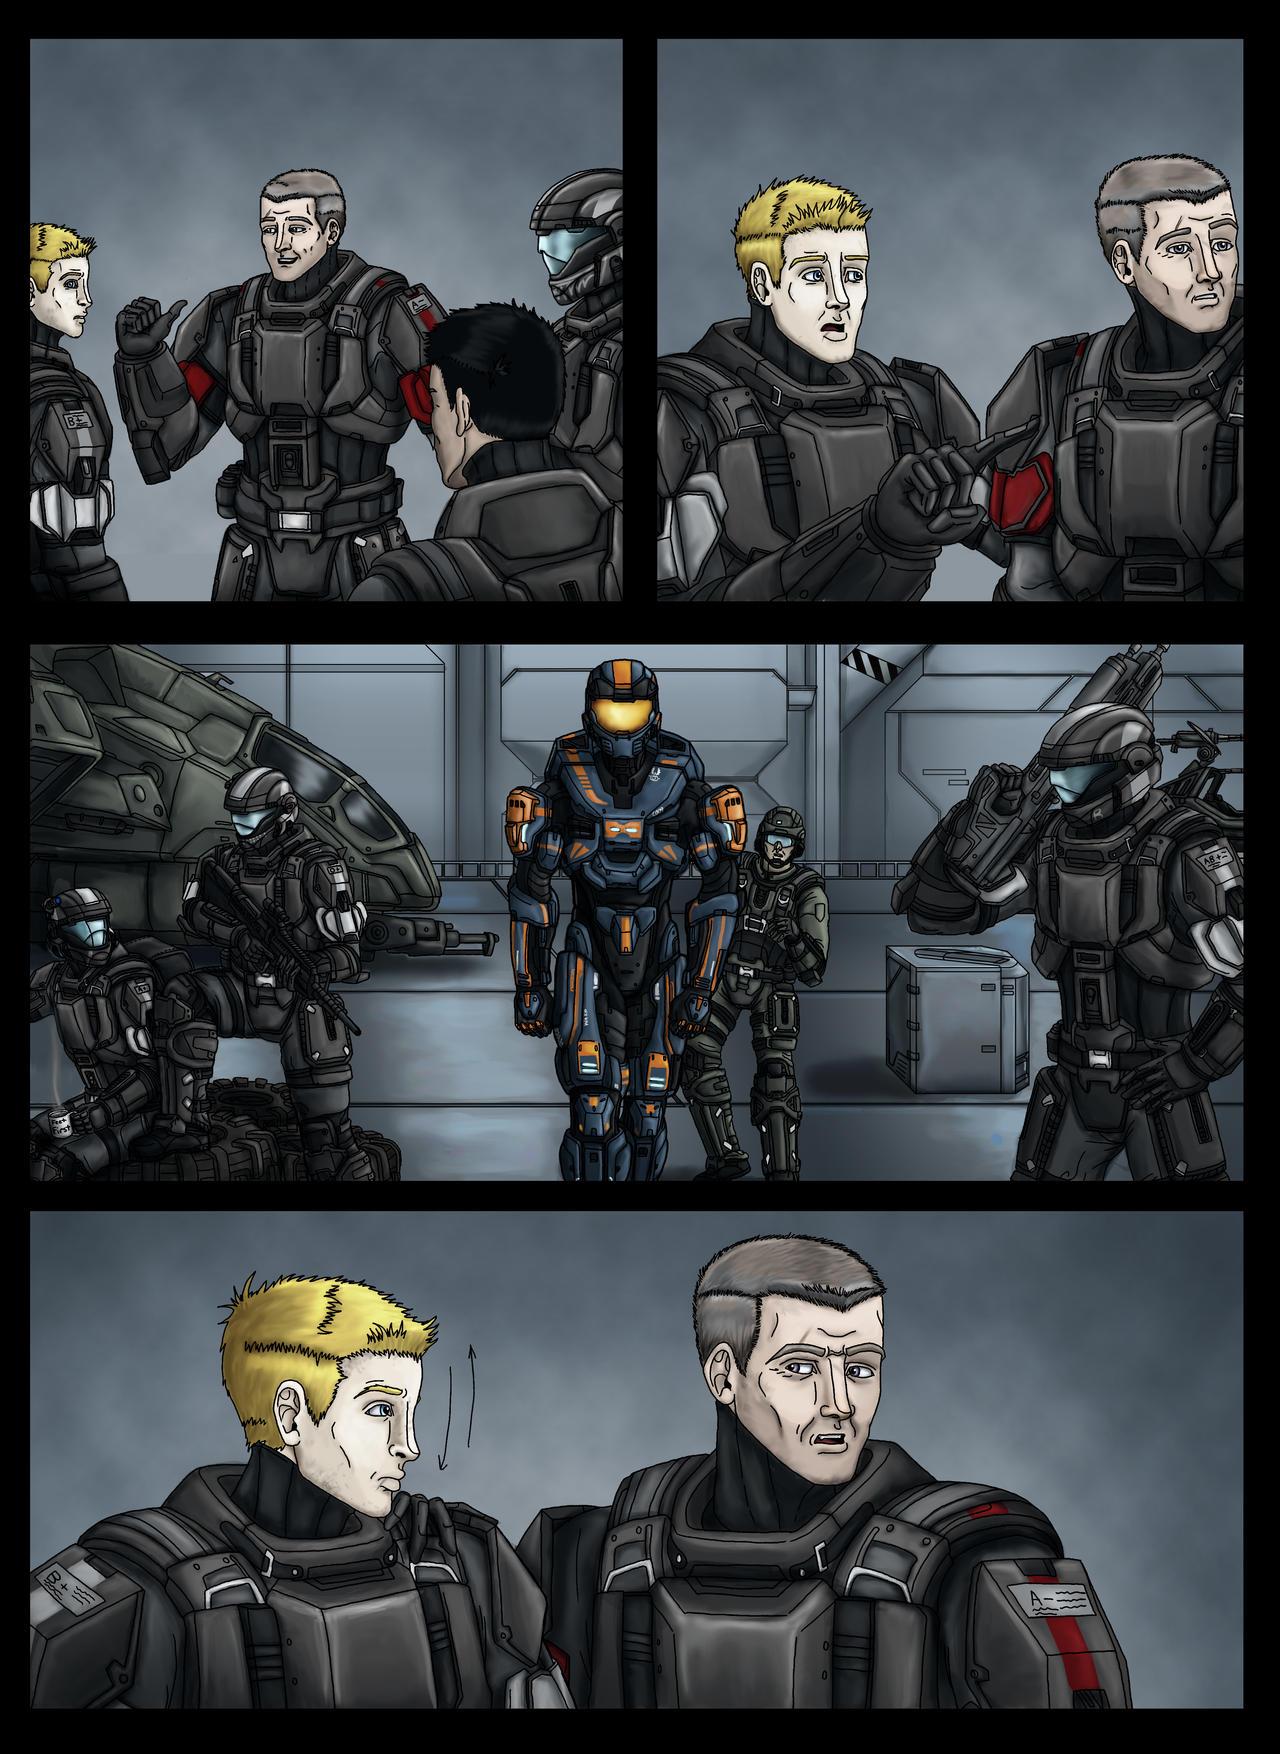 My Halo Related Art (Armor/Comics/etc   ) | Community